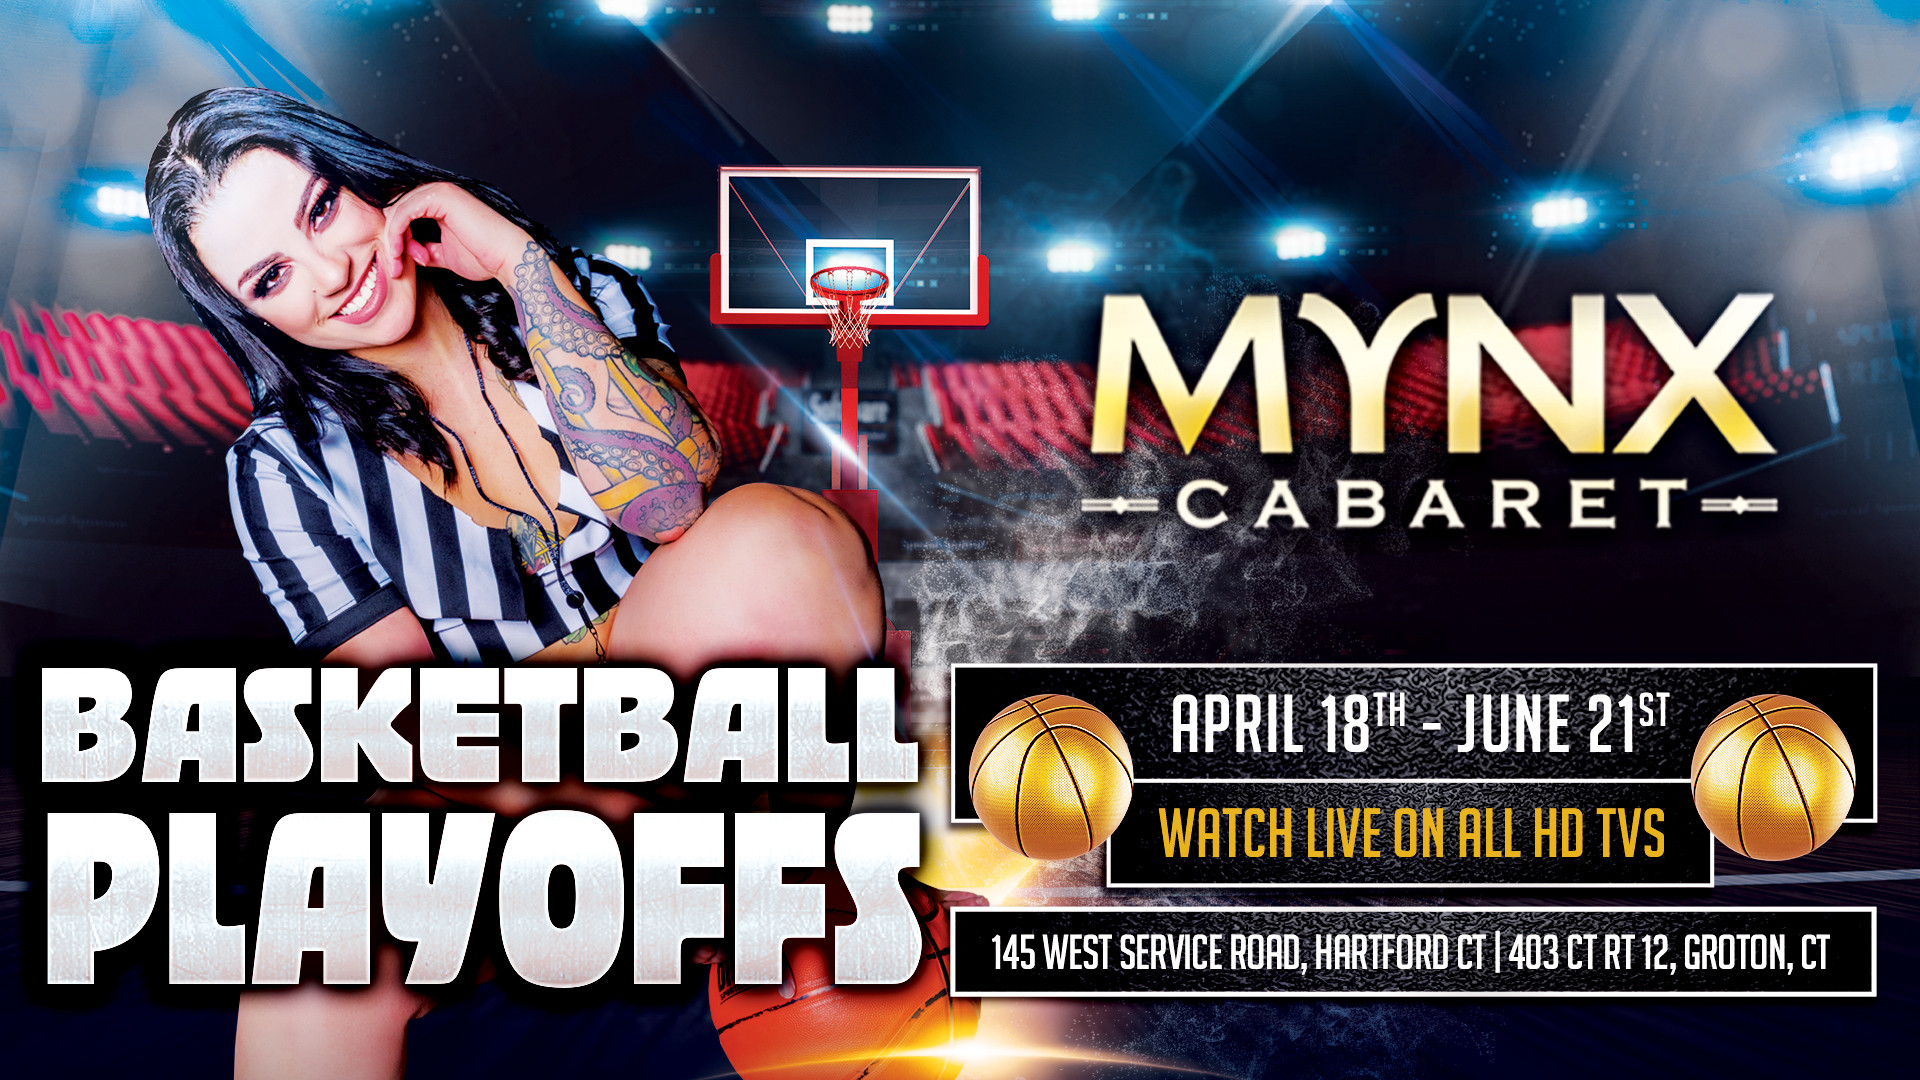 MYNX_NBA_Flyer_1920_1080.jpg